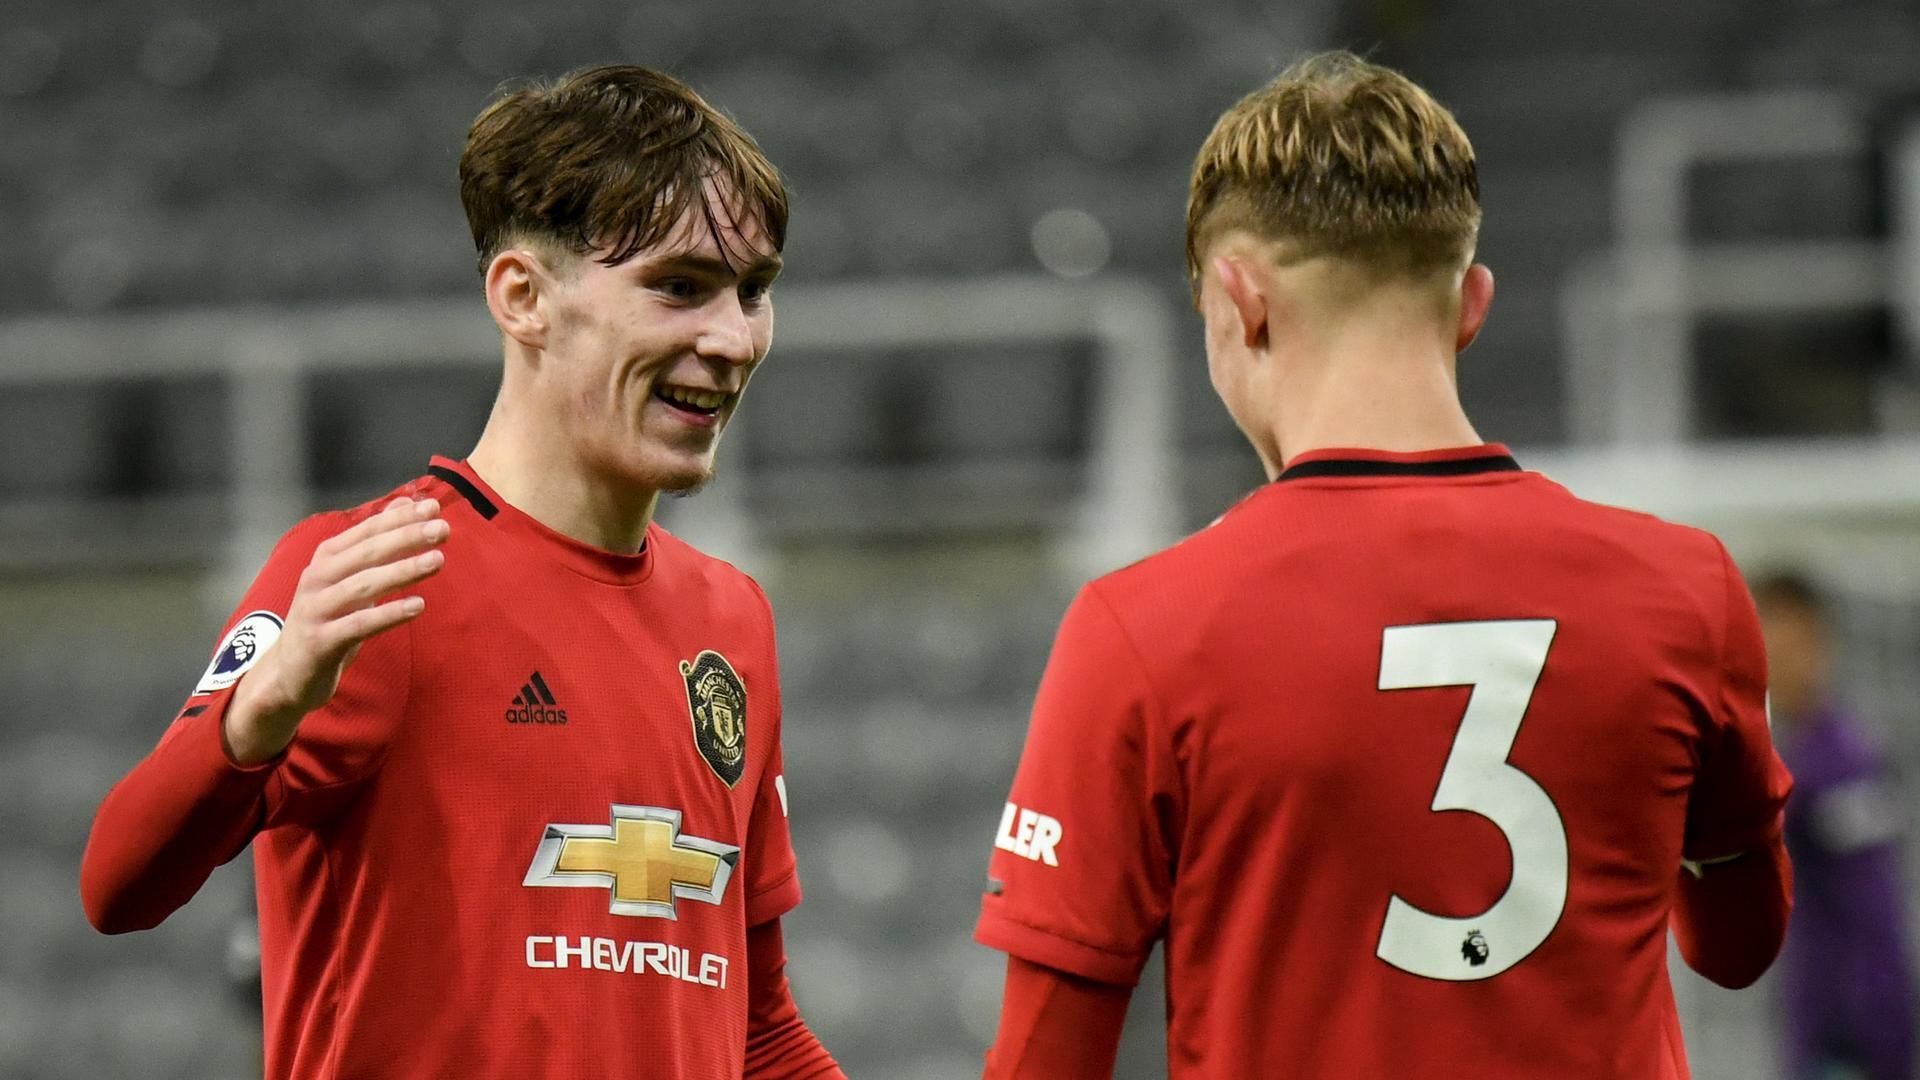 match report premier league 2 u23s newcastle v man utd 23 Aug 19 - Manchester United